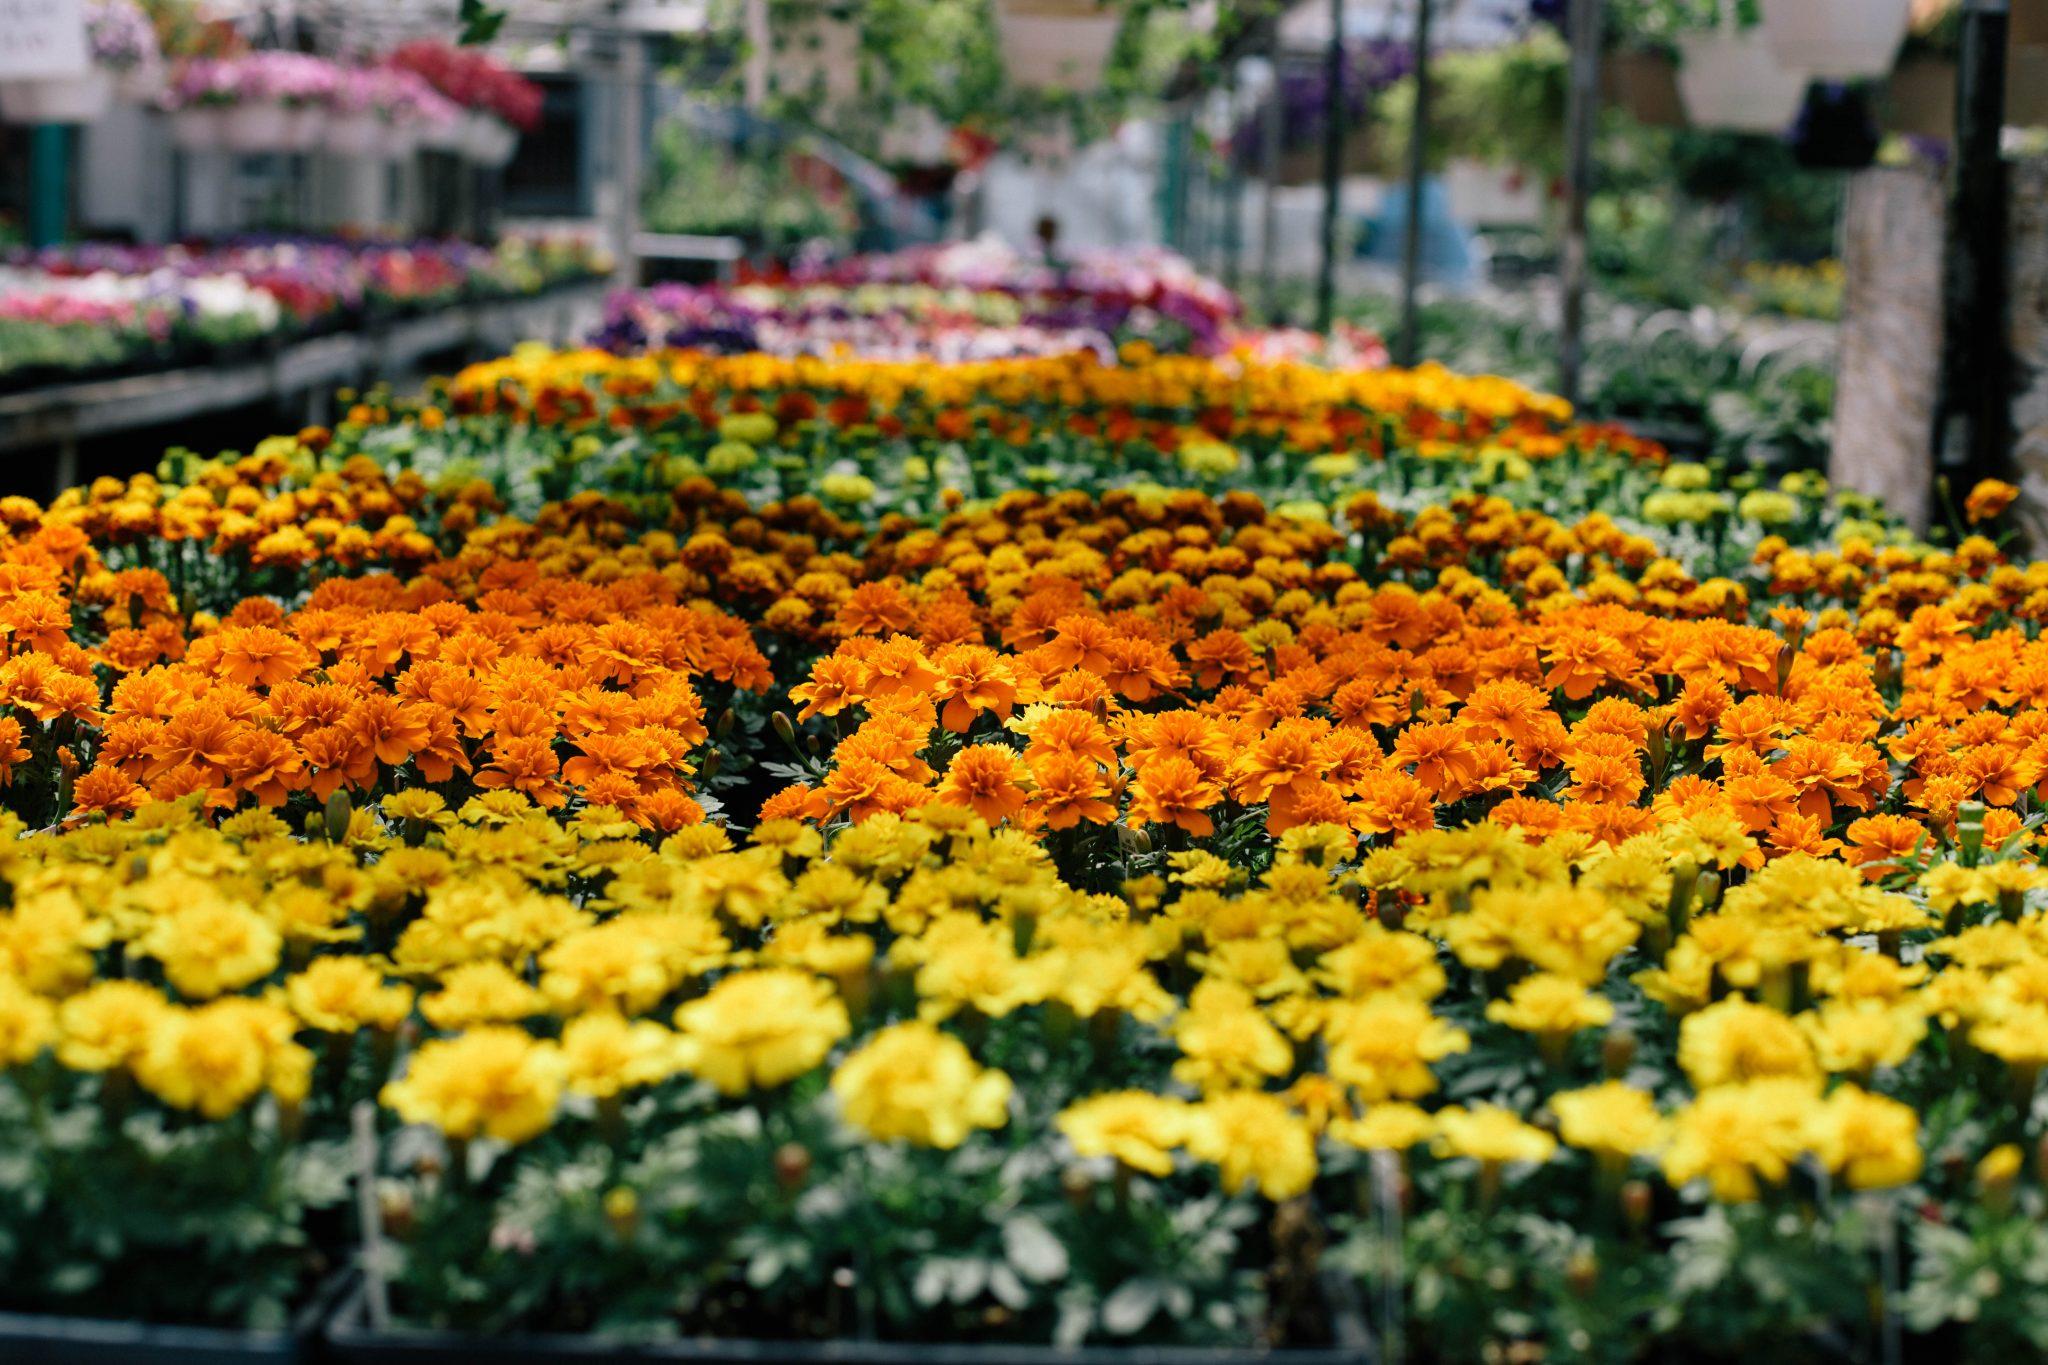 cleveland-puritas-nursery-and-garden-1